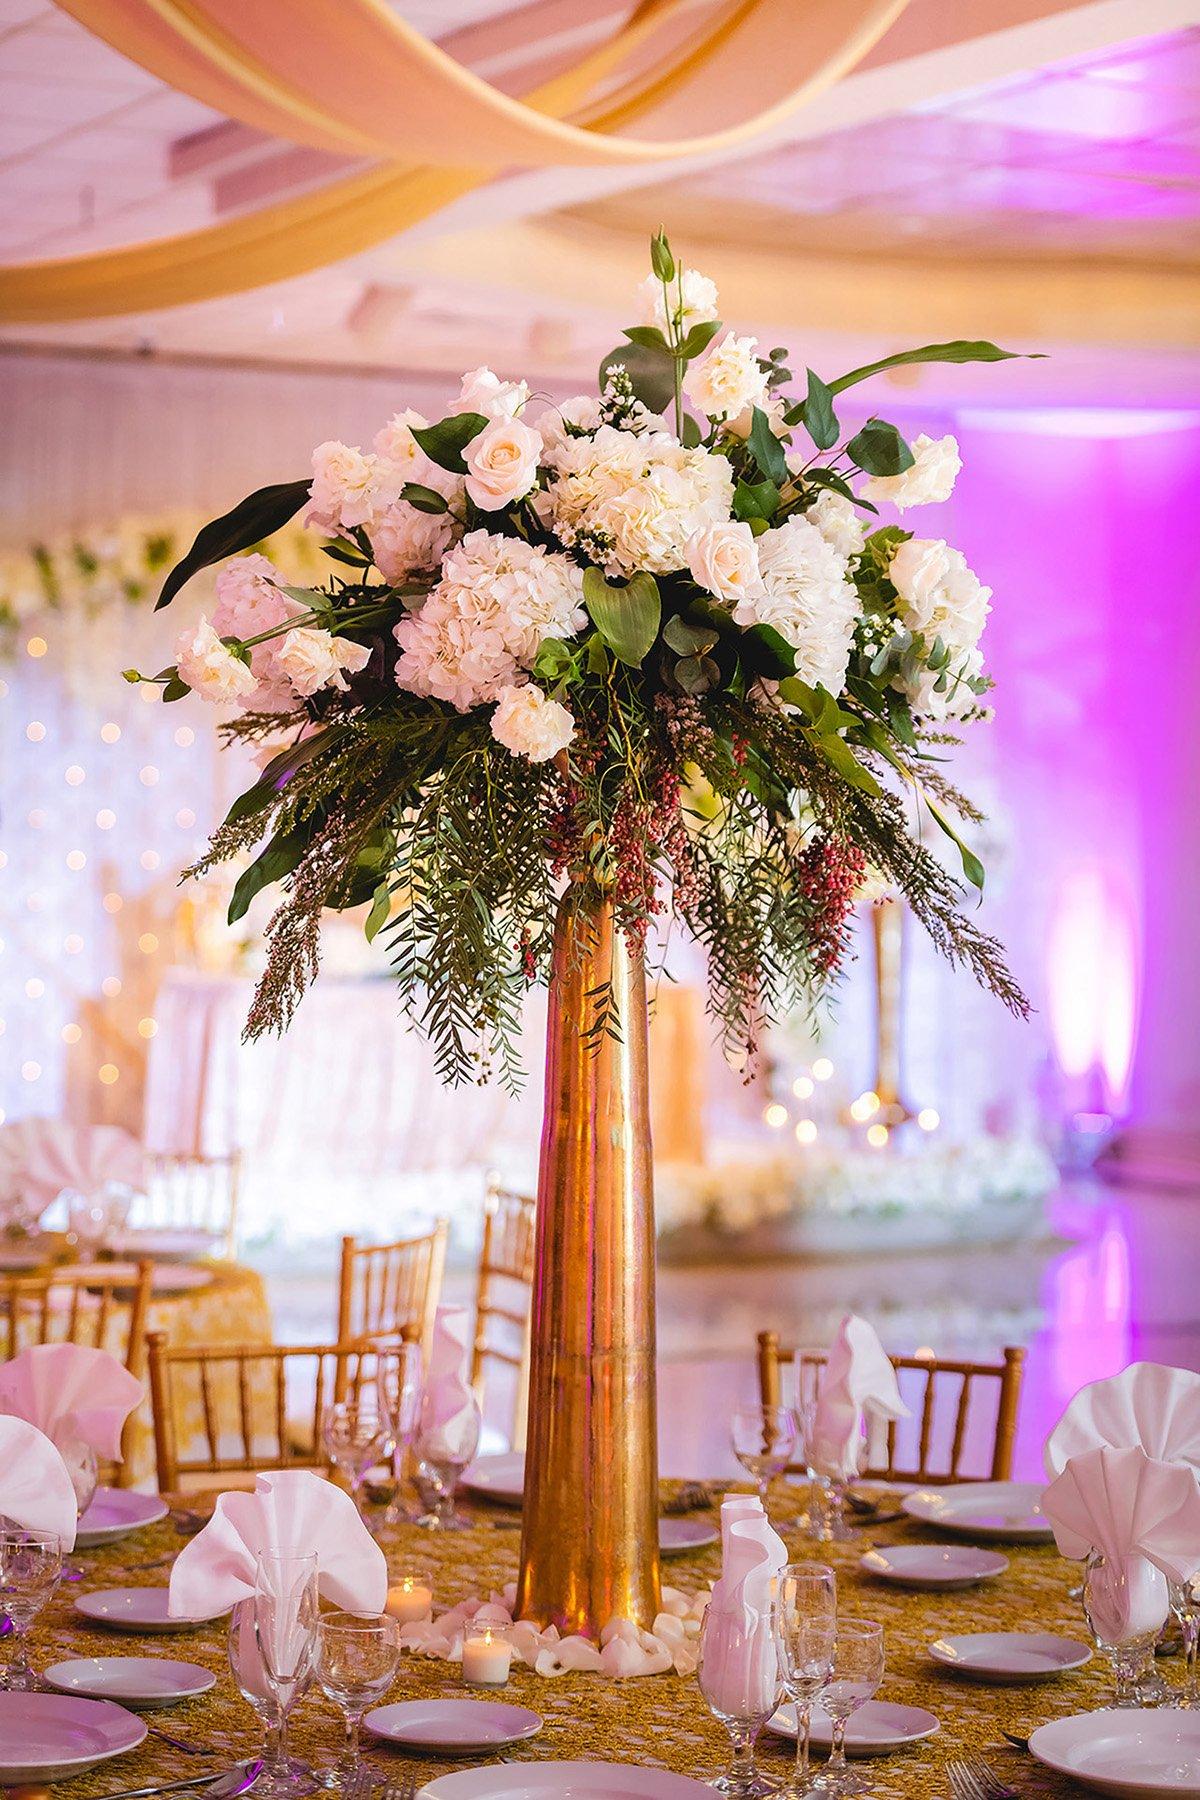 Wedding-Decore-Photo Details